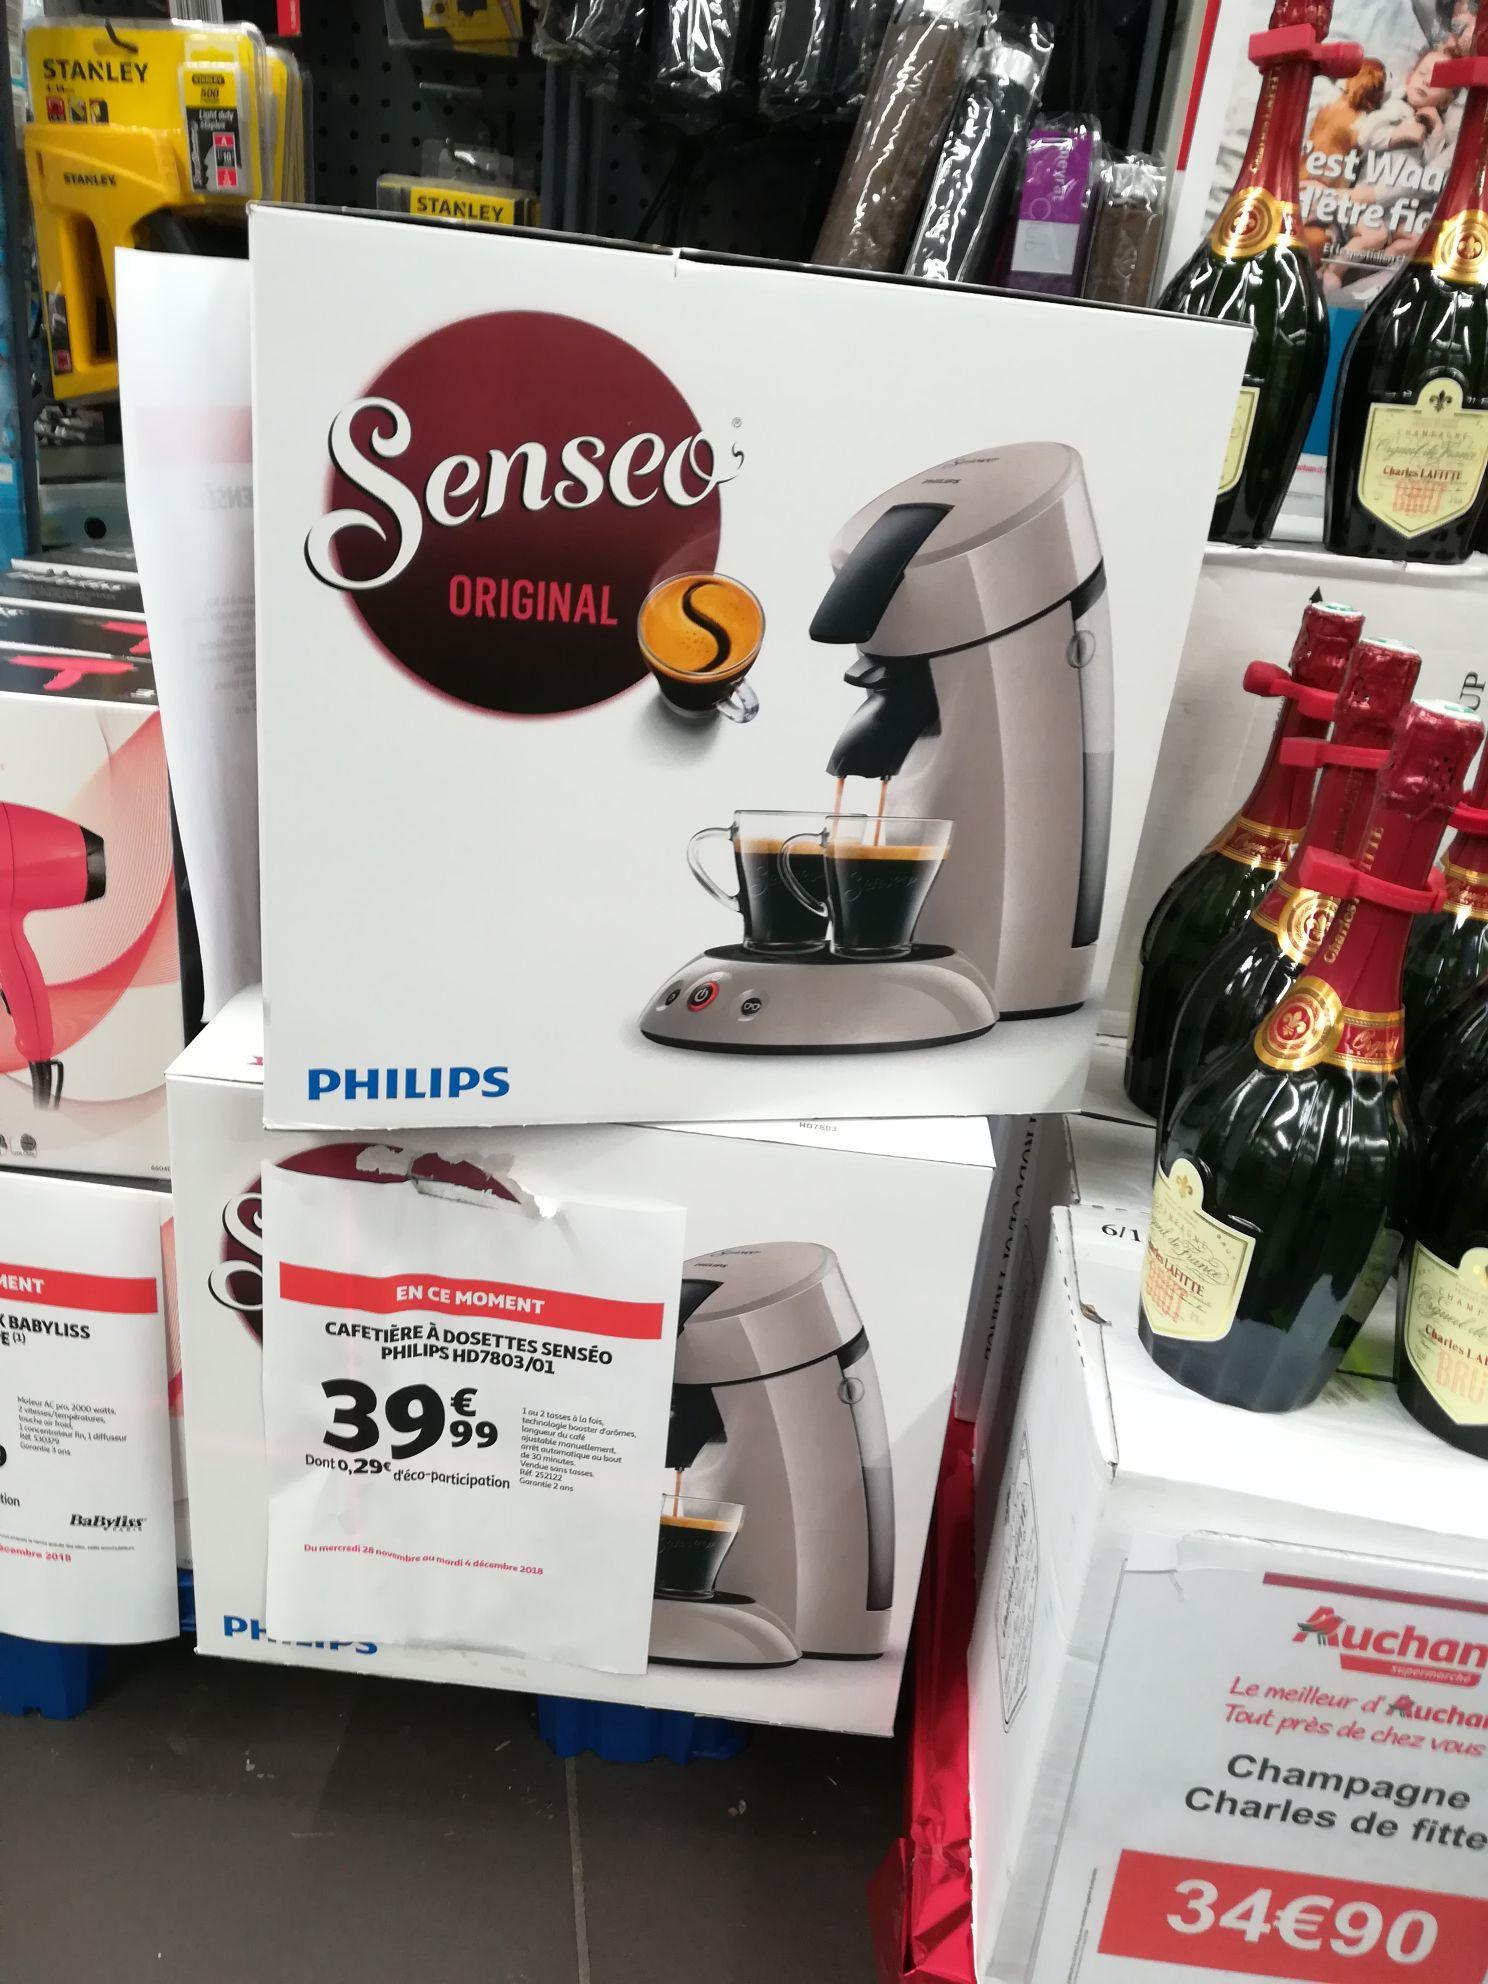 Machine à café Senseo original Philips HD7803/01 - Auchan Lyon (69)